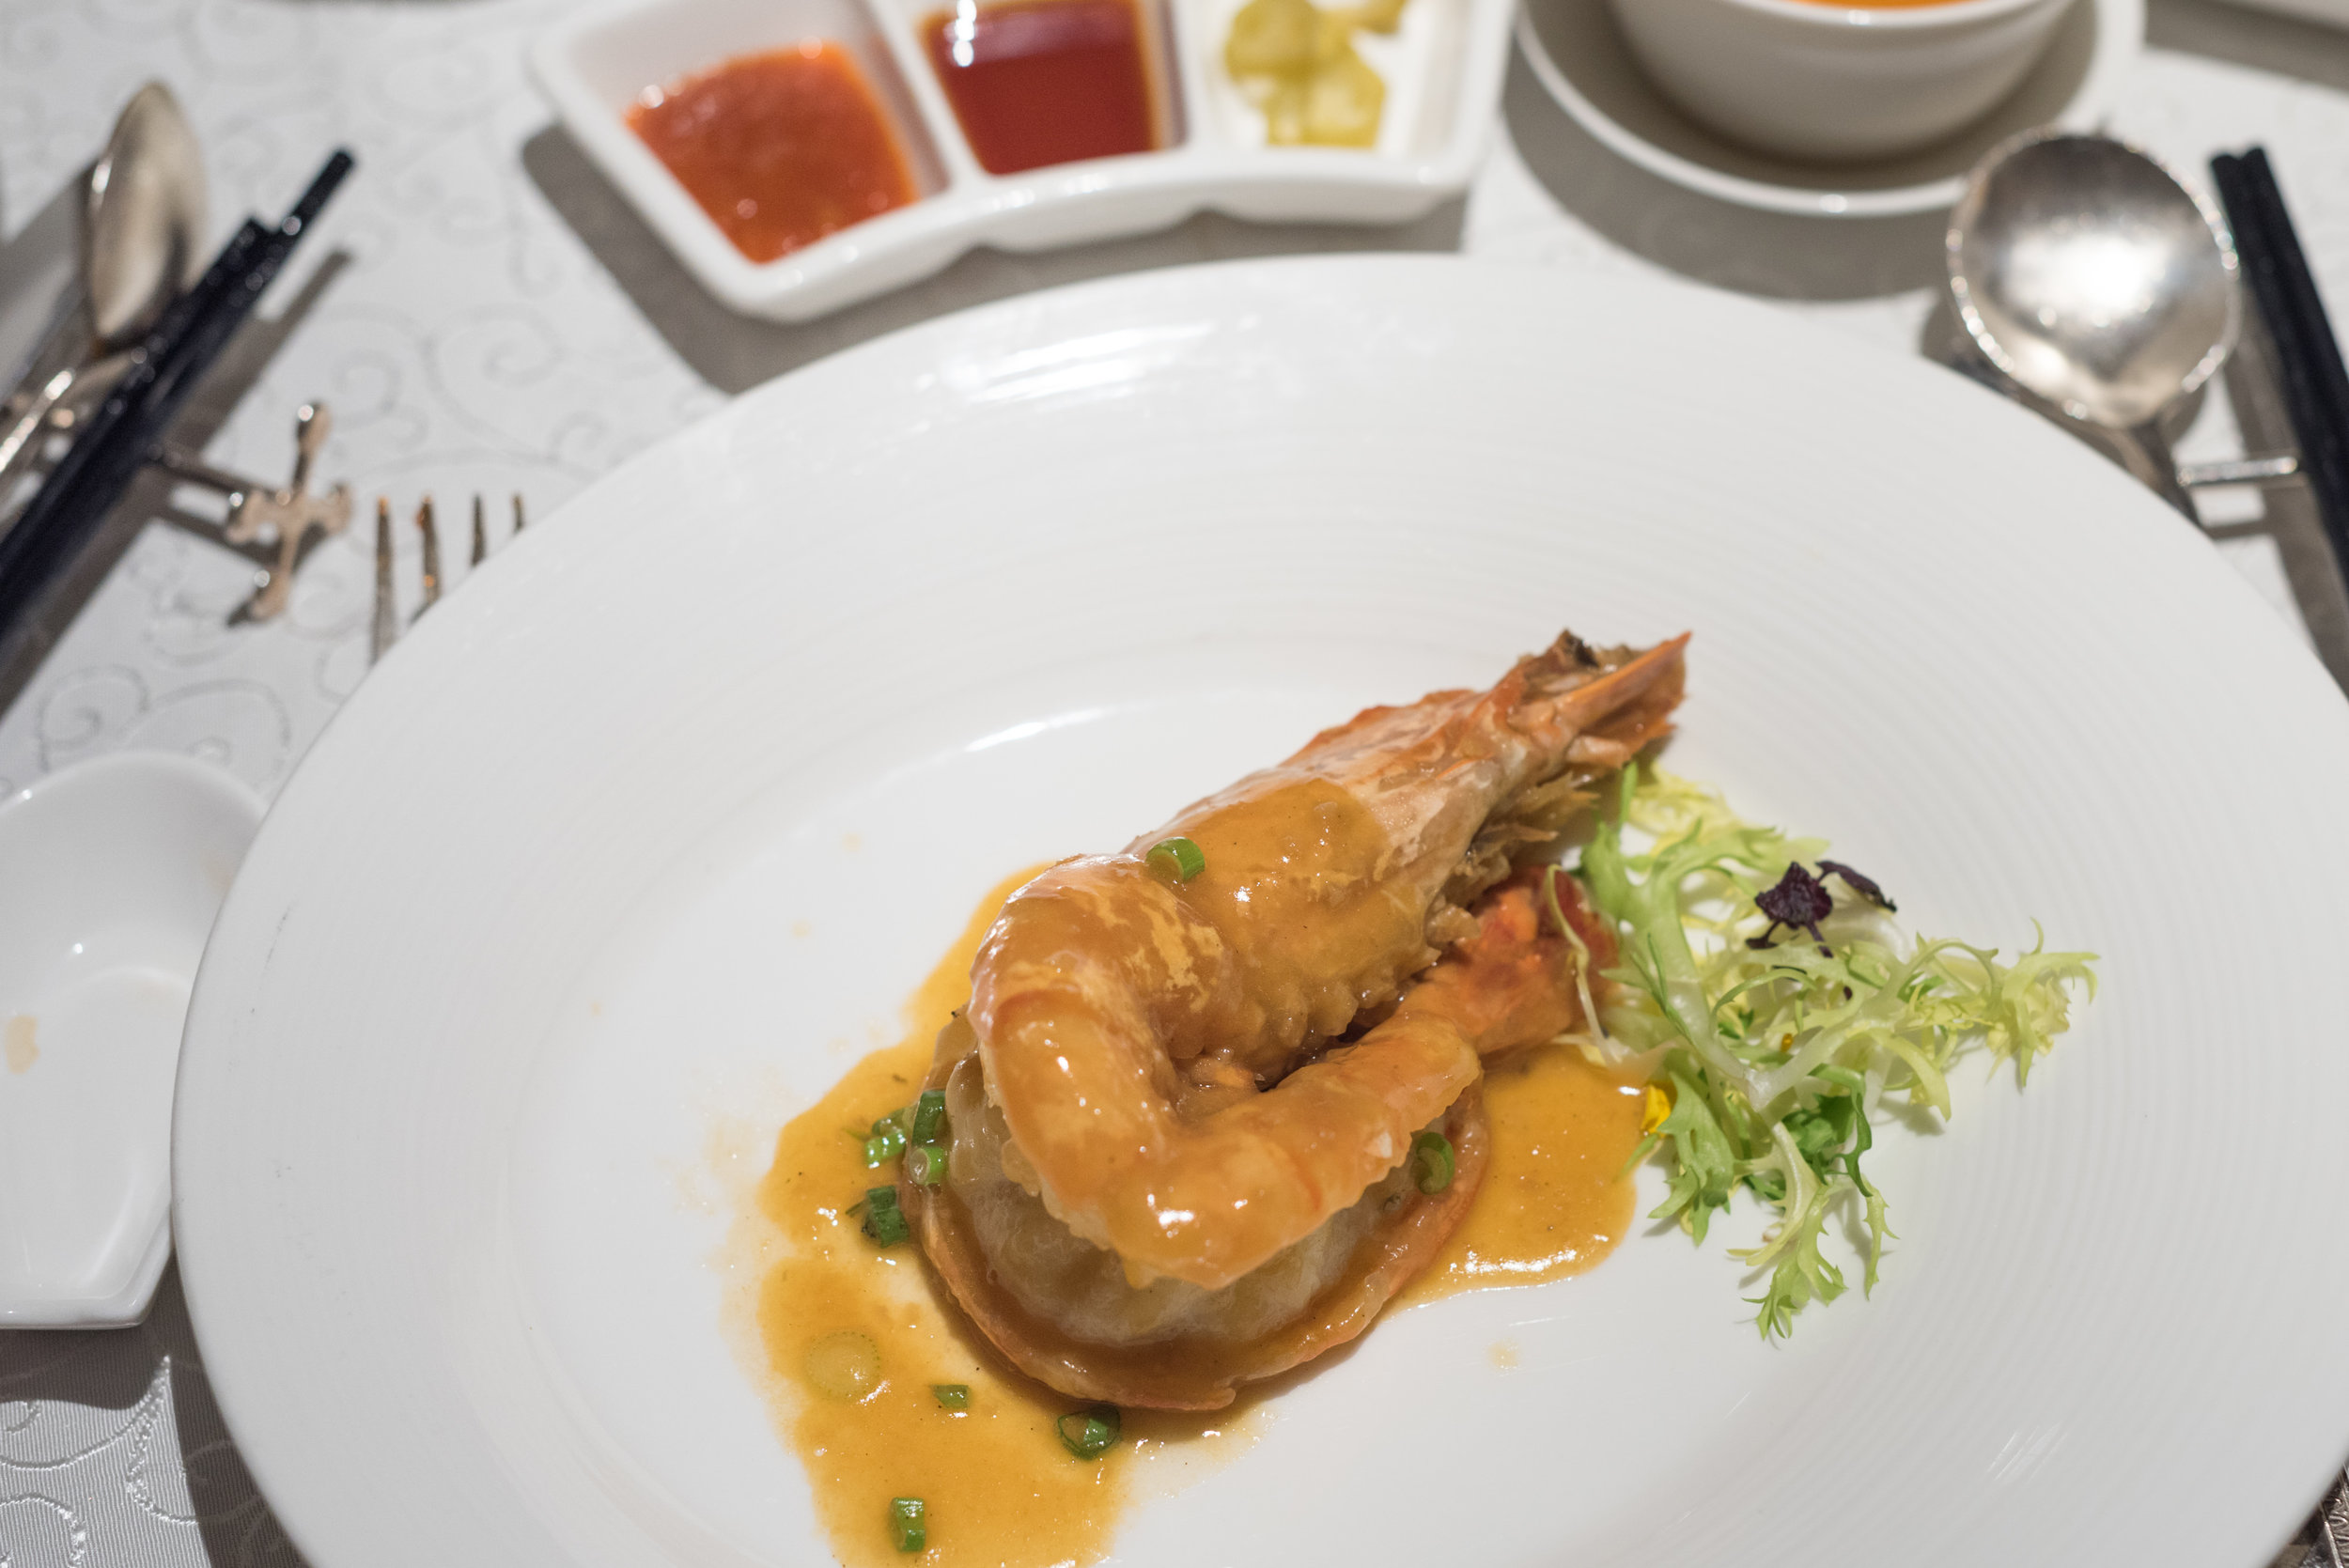 Braised King Prawn with Shrimp Oil  Yan Ting - The St. Regis Singapore